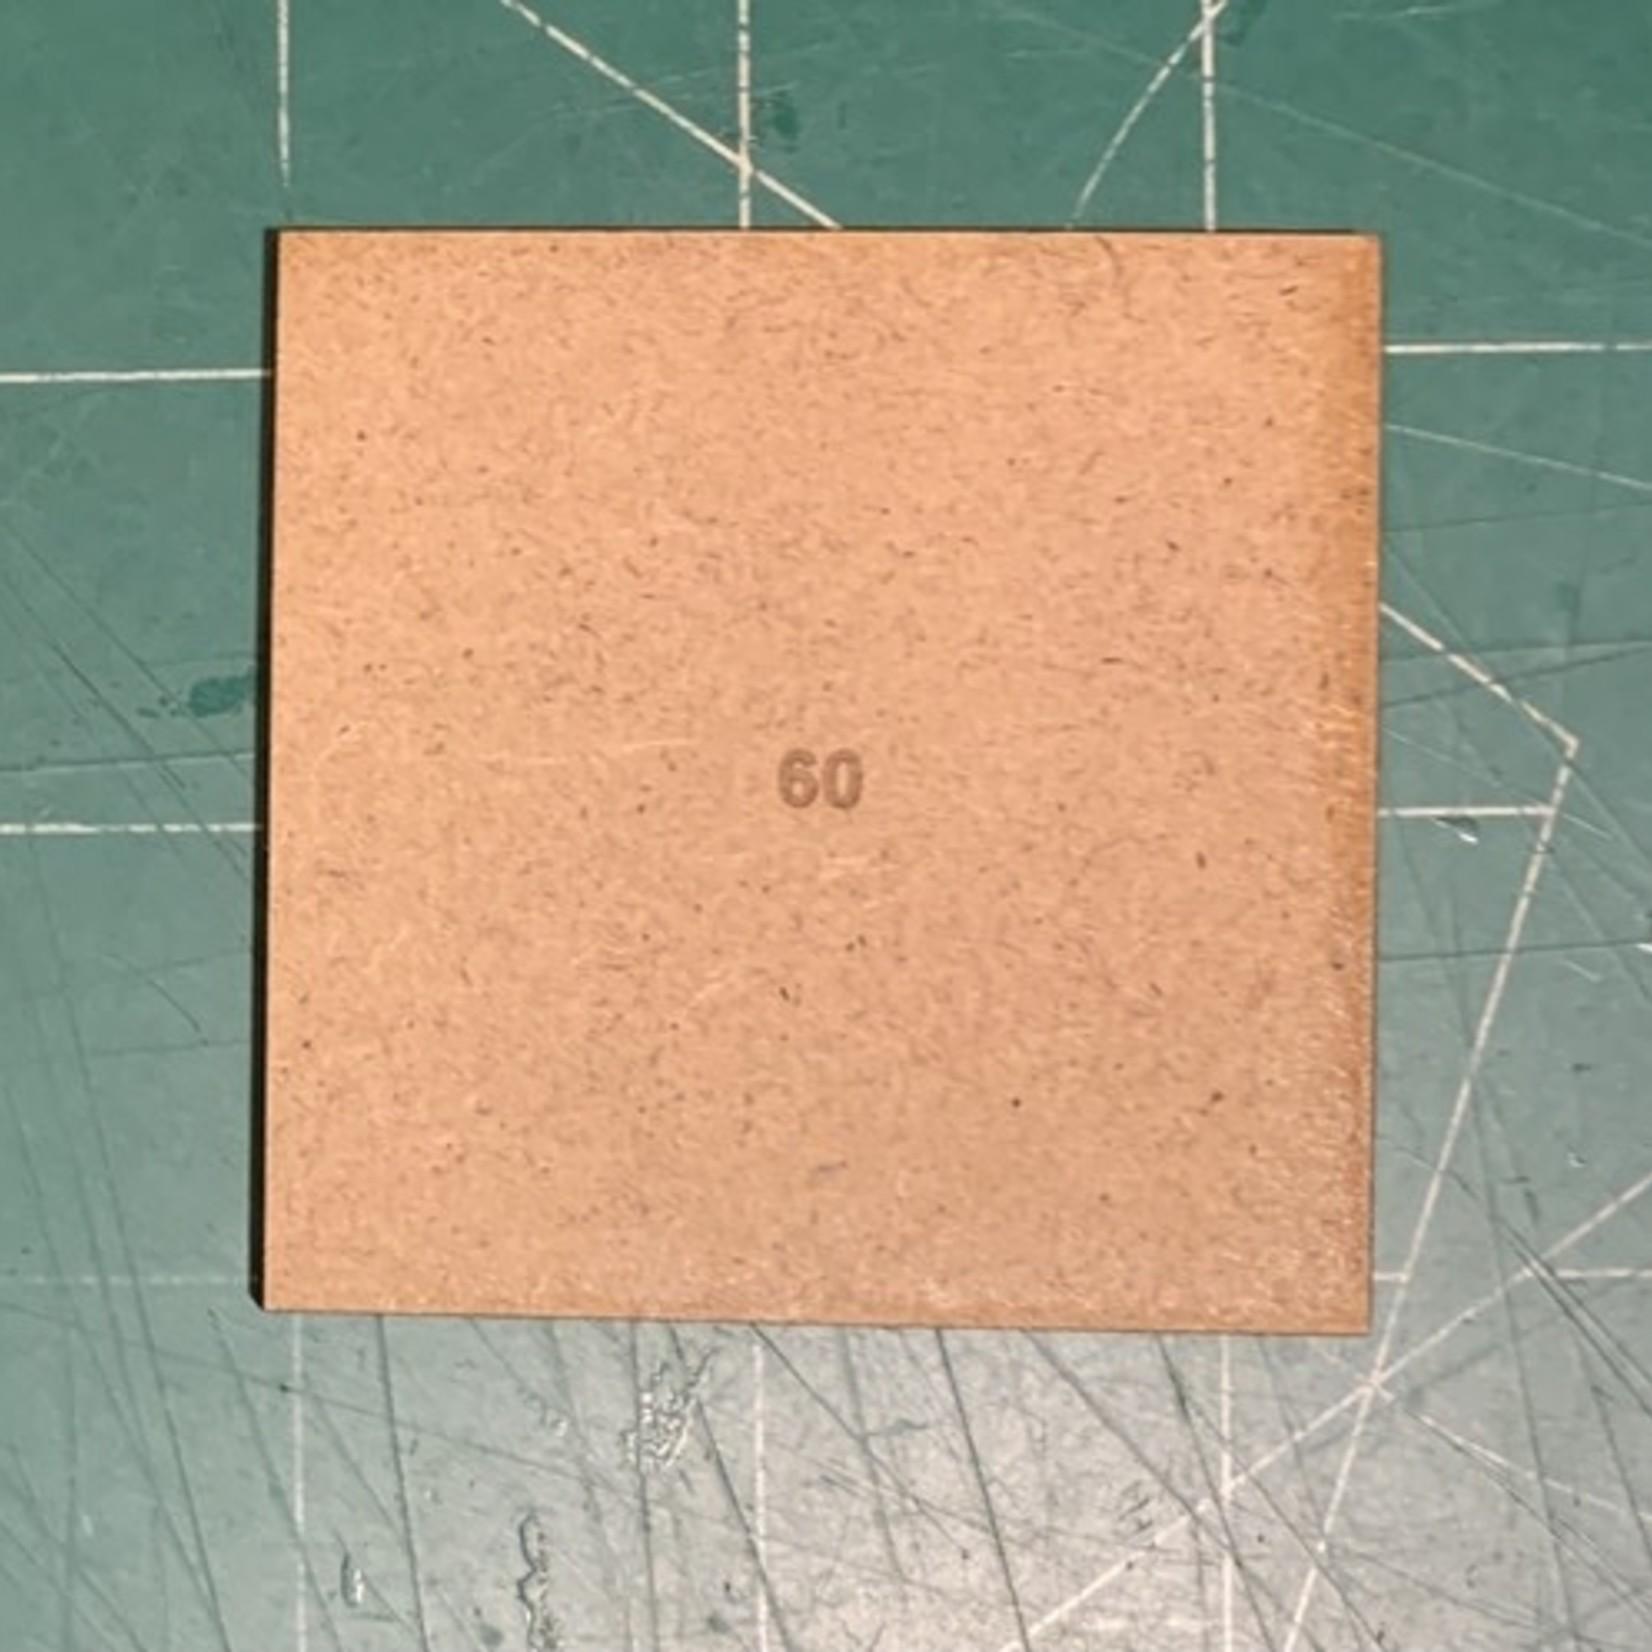 Square 60mm MDF Bases